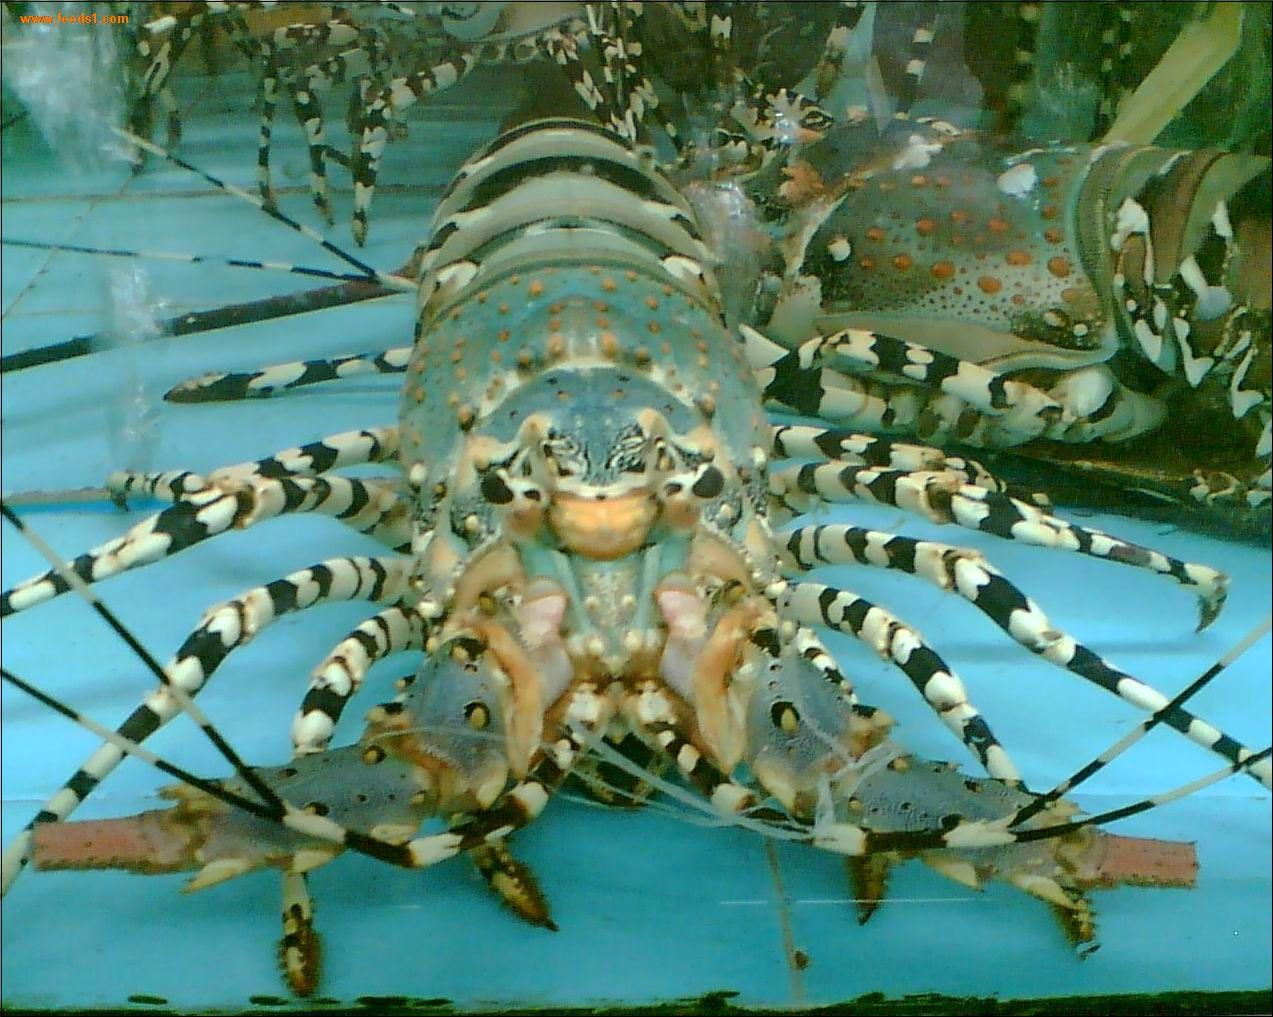 gambar lobster - gambar lobster